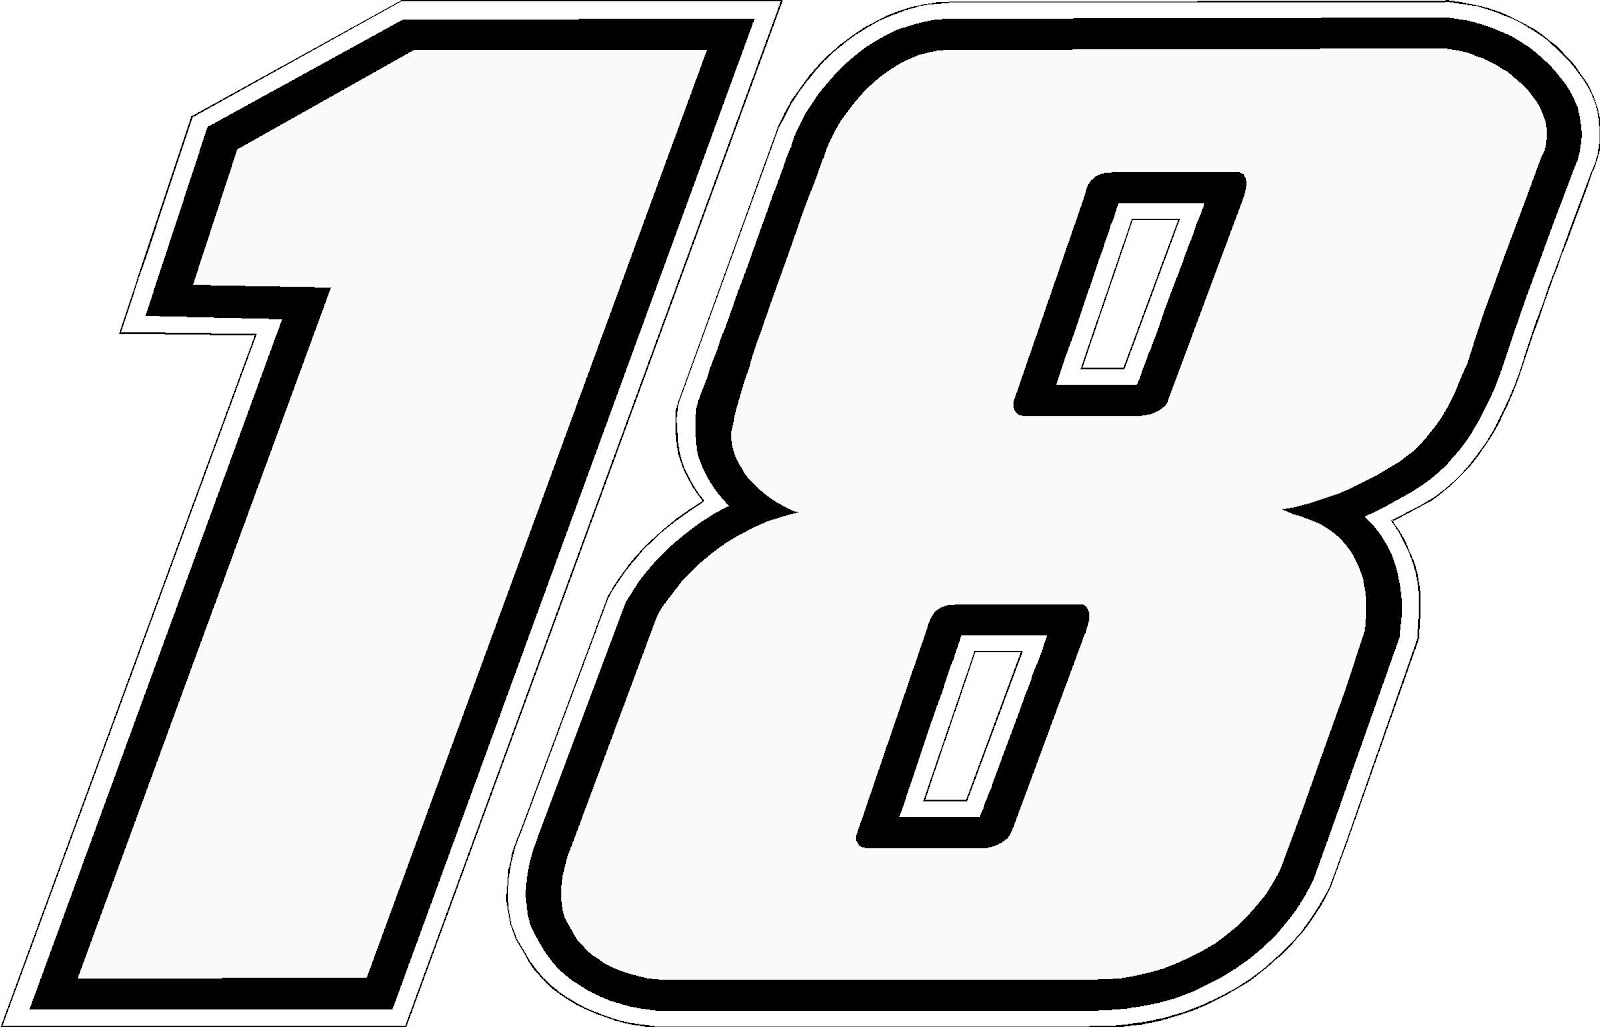 Gibbs Garage Jgr Drivers Survive Talladega Smash Up And